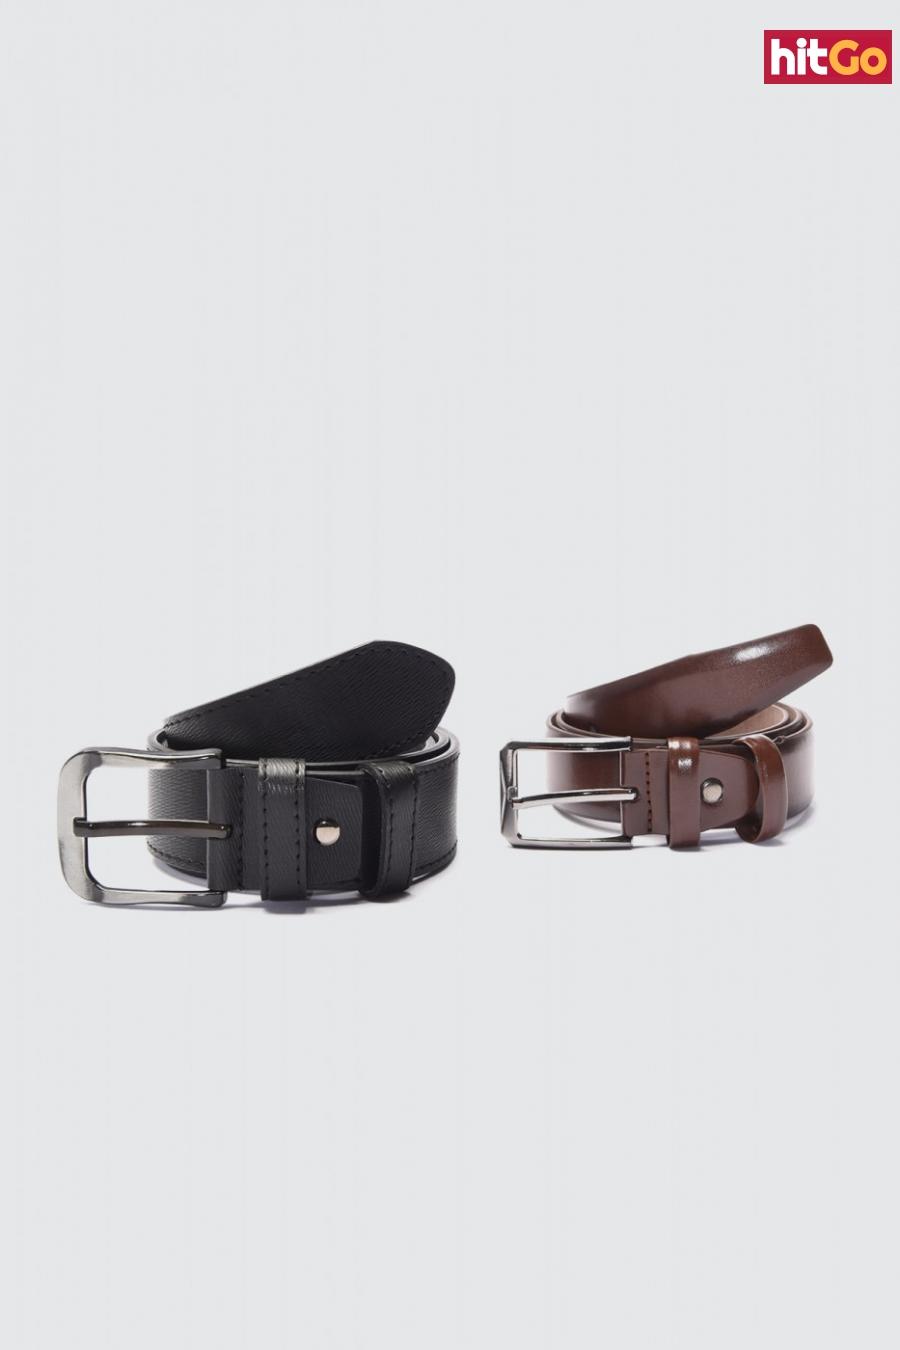 Trendyol Multicolored Mens 2-way FD Leather Belt pánské 115 cm